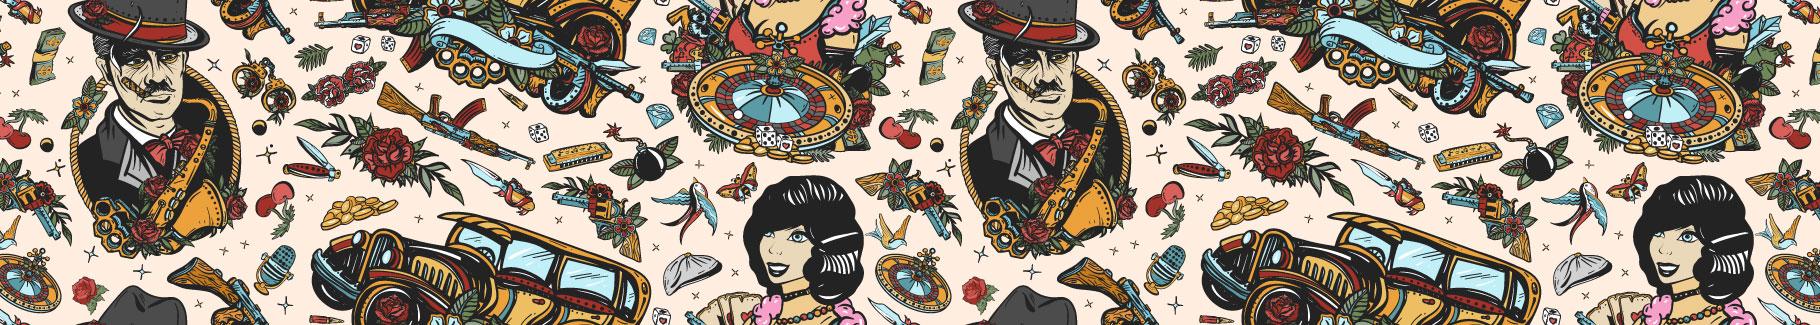 Plakat retro – amerykańskie kasyno